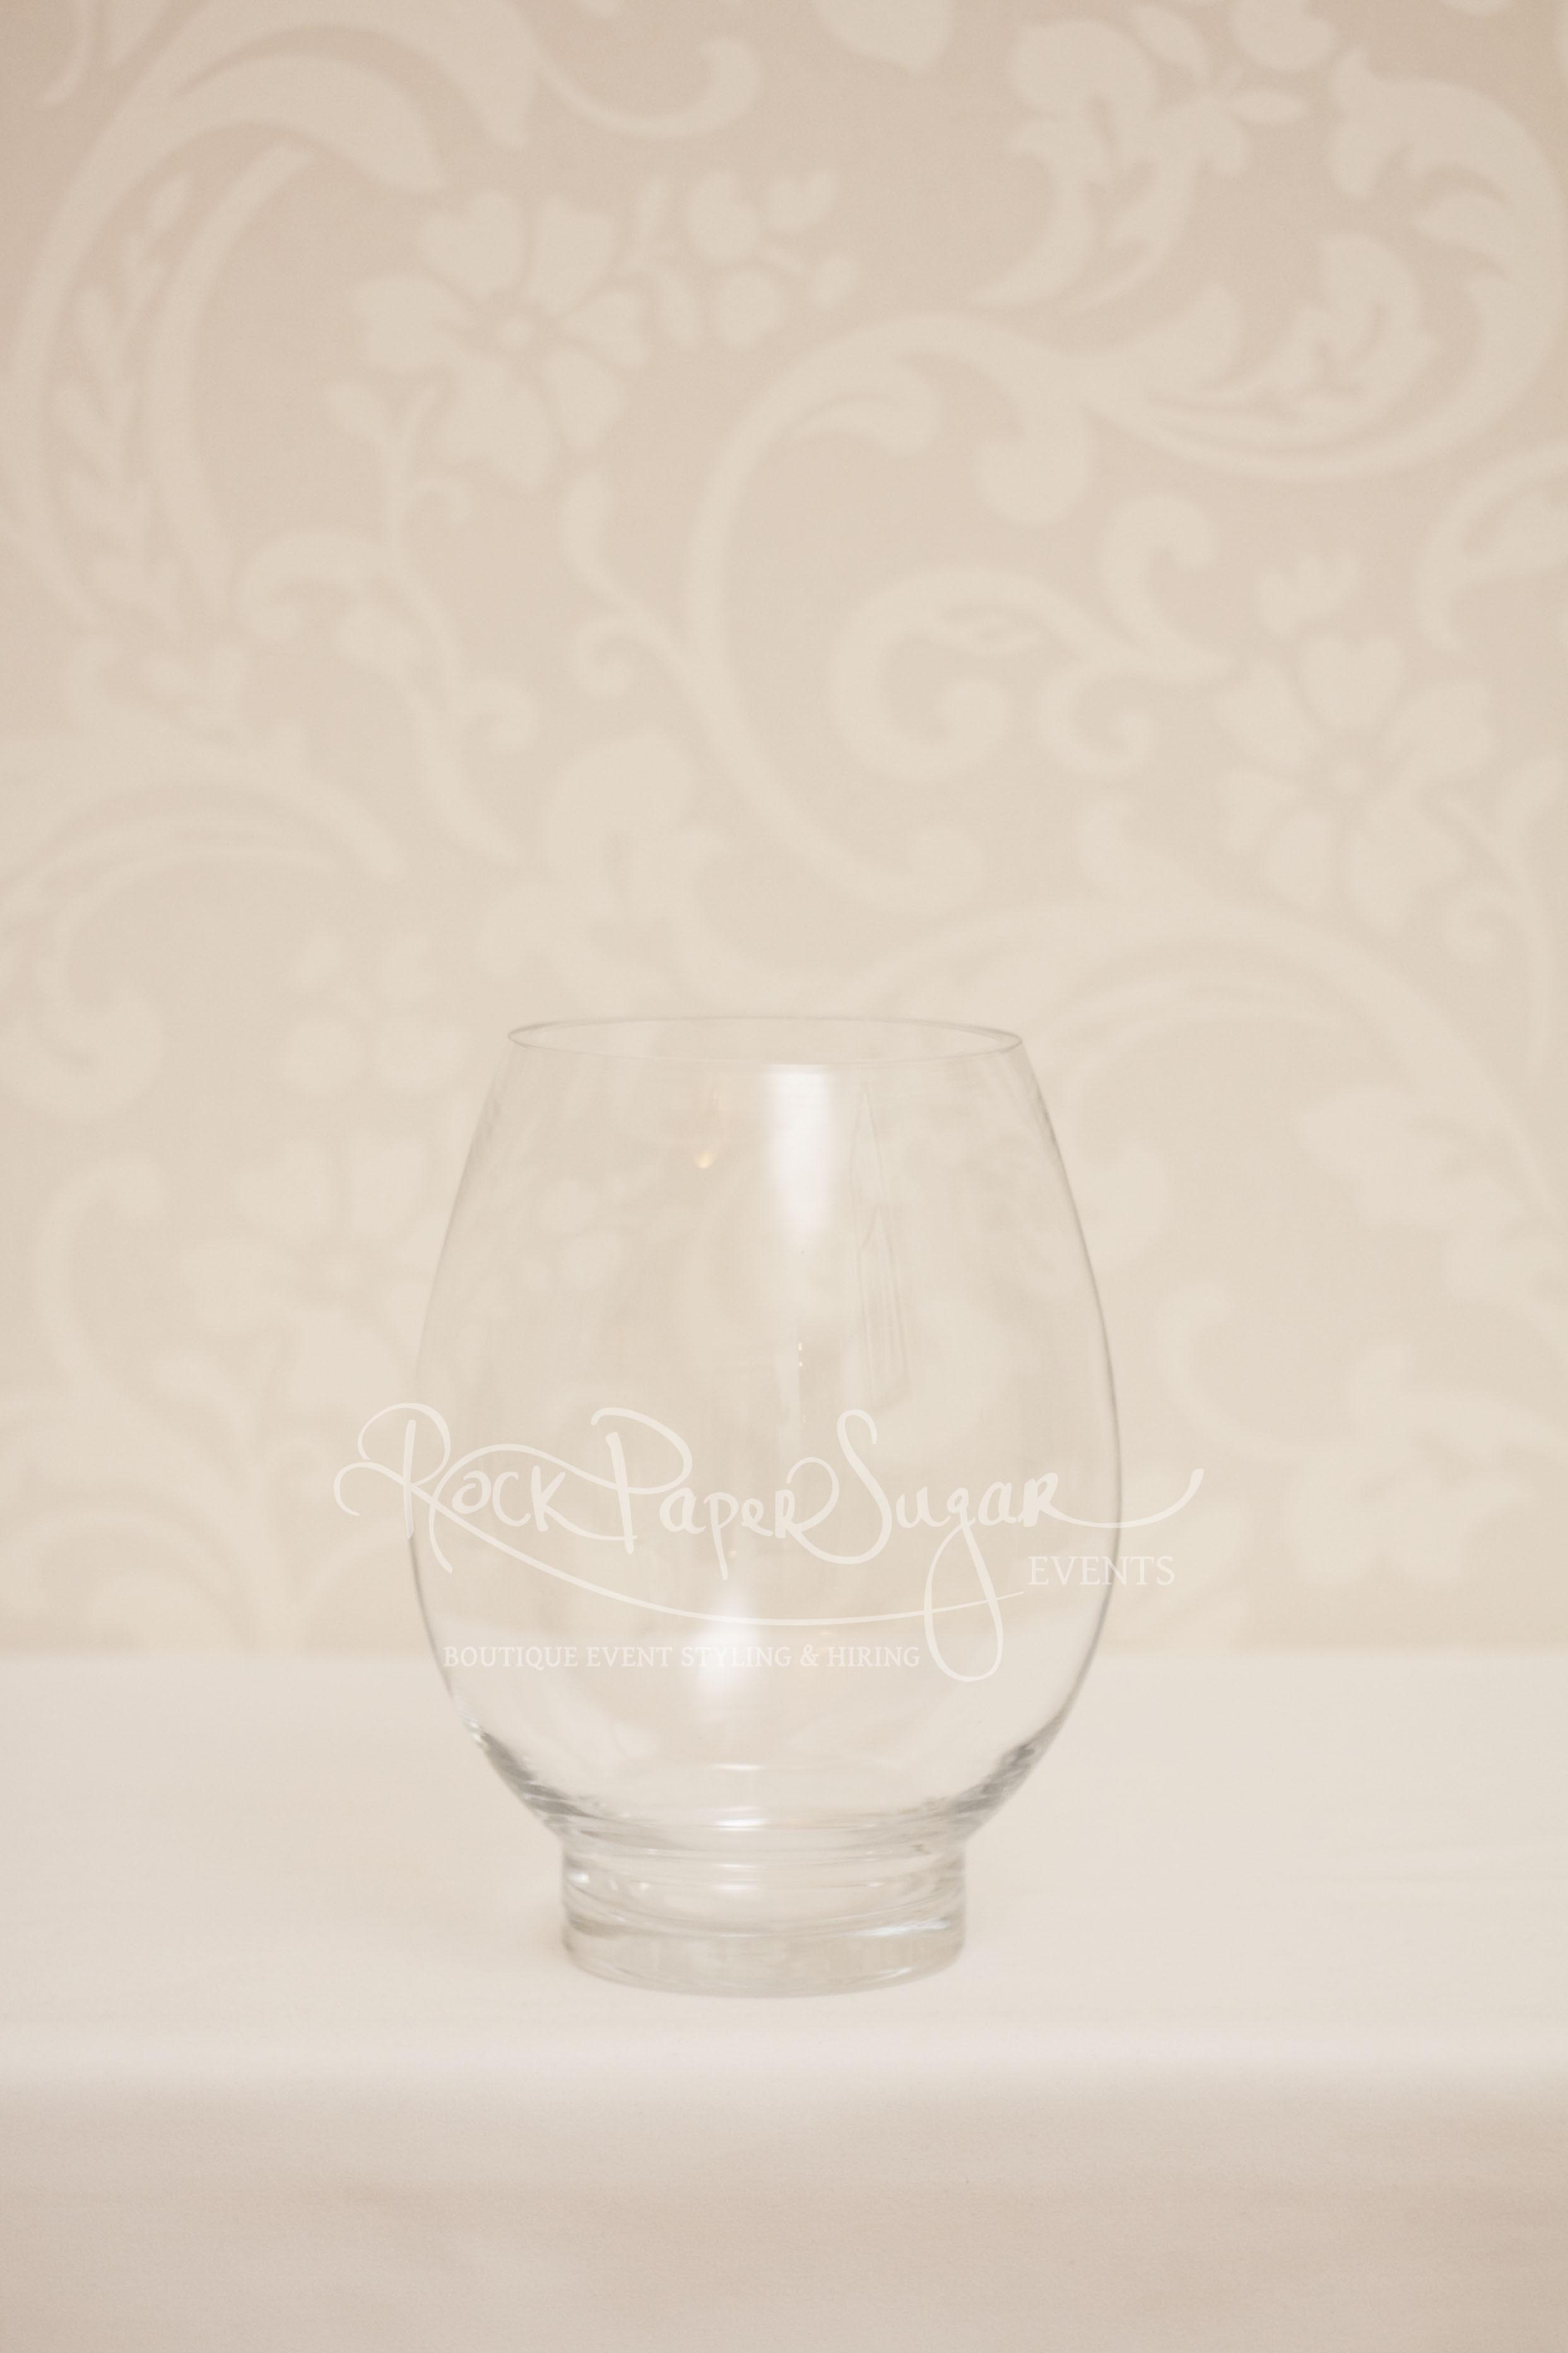 Rock Paper Sugar Events Glassware 011.jpg